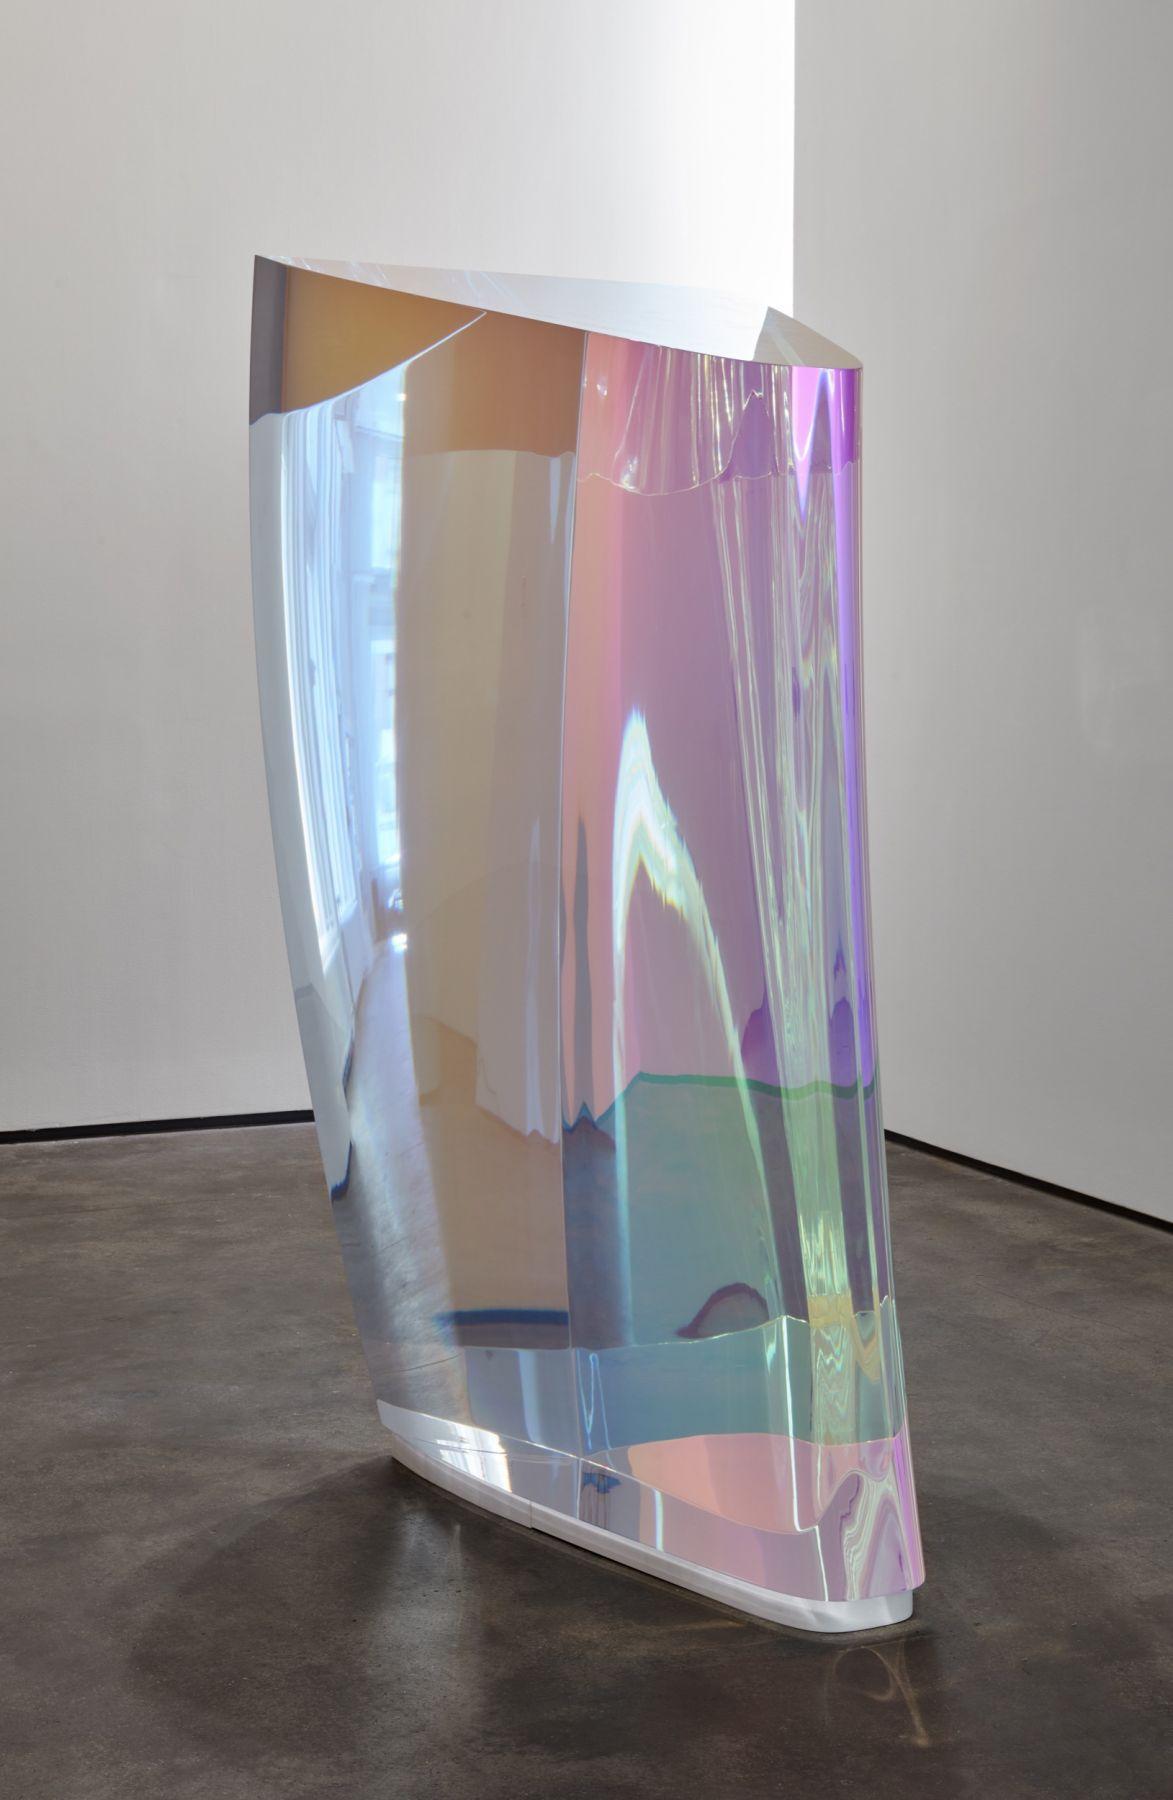 MARIKO MORI Plasma Stone I, 2017-2018